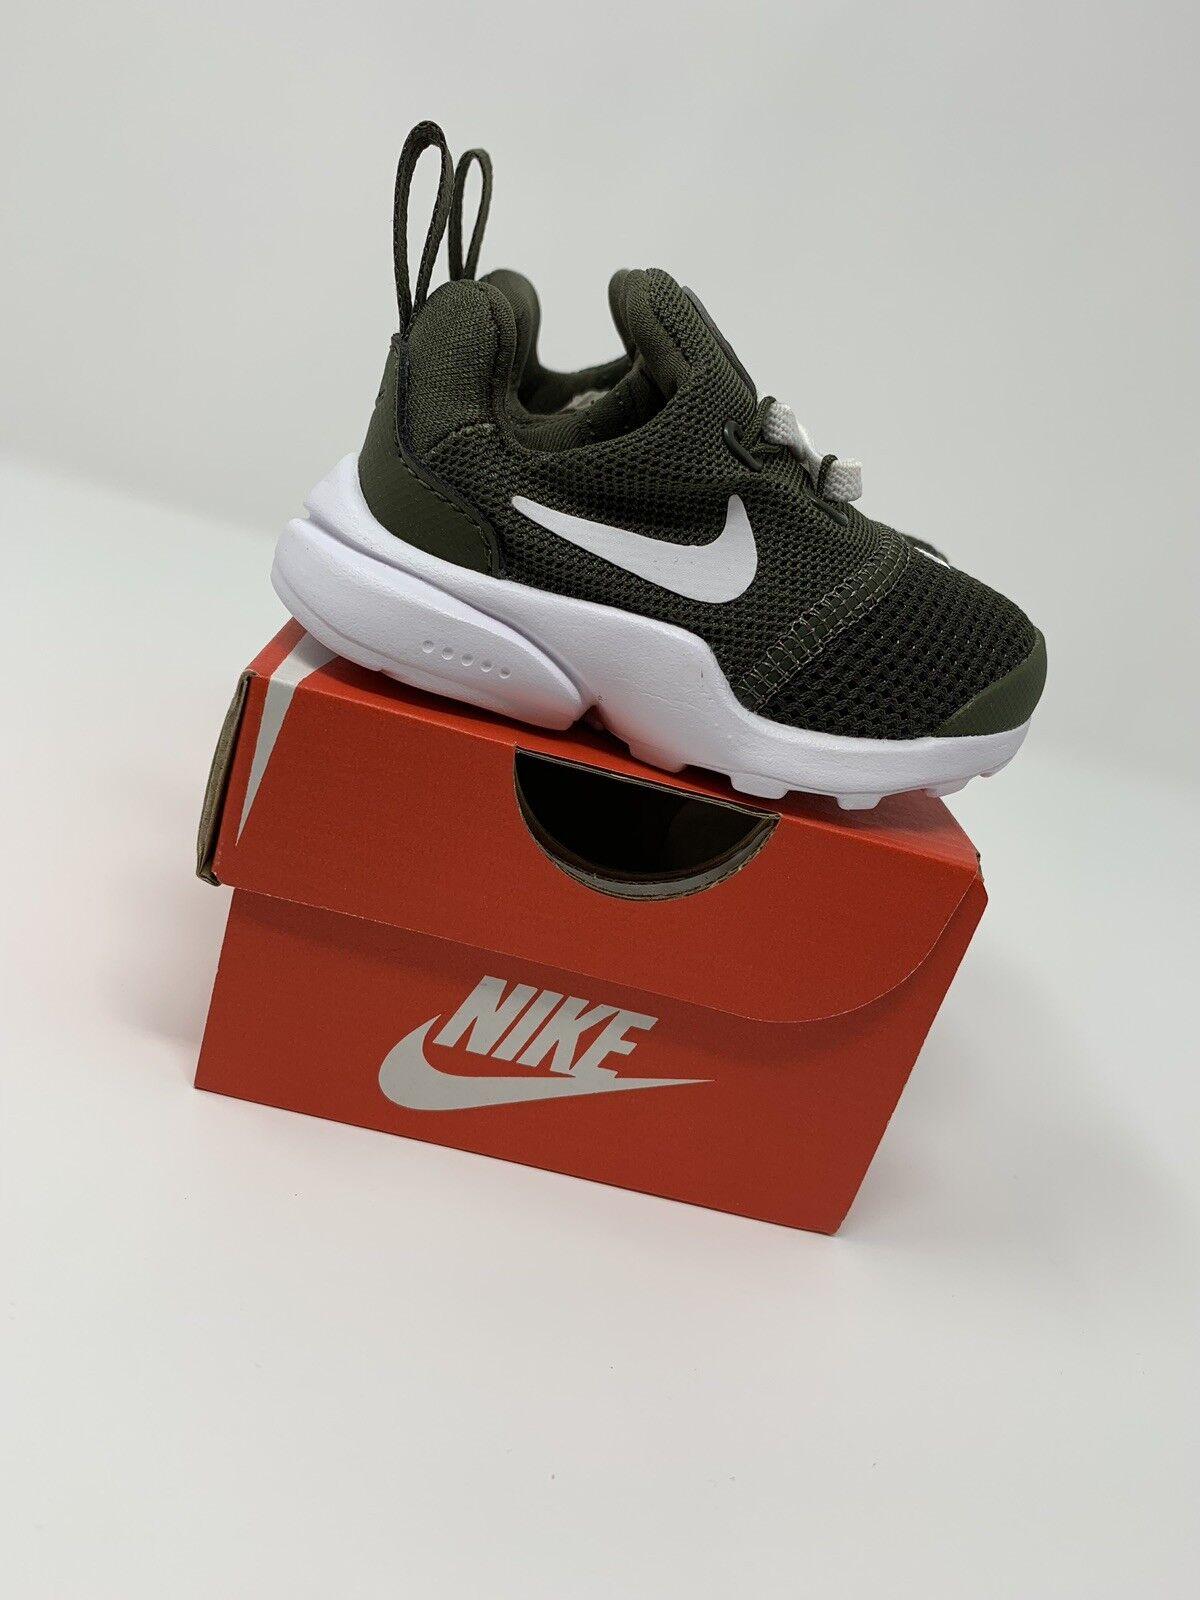 BABY BOYS: Nike Presto Fly Shoes, Green - Size 2C AJ0889-300